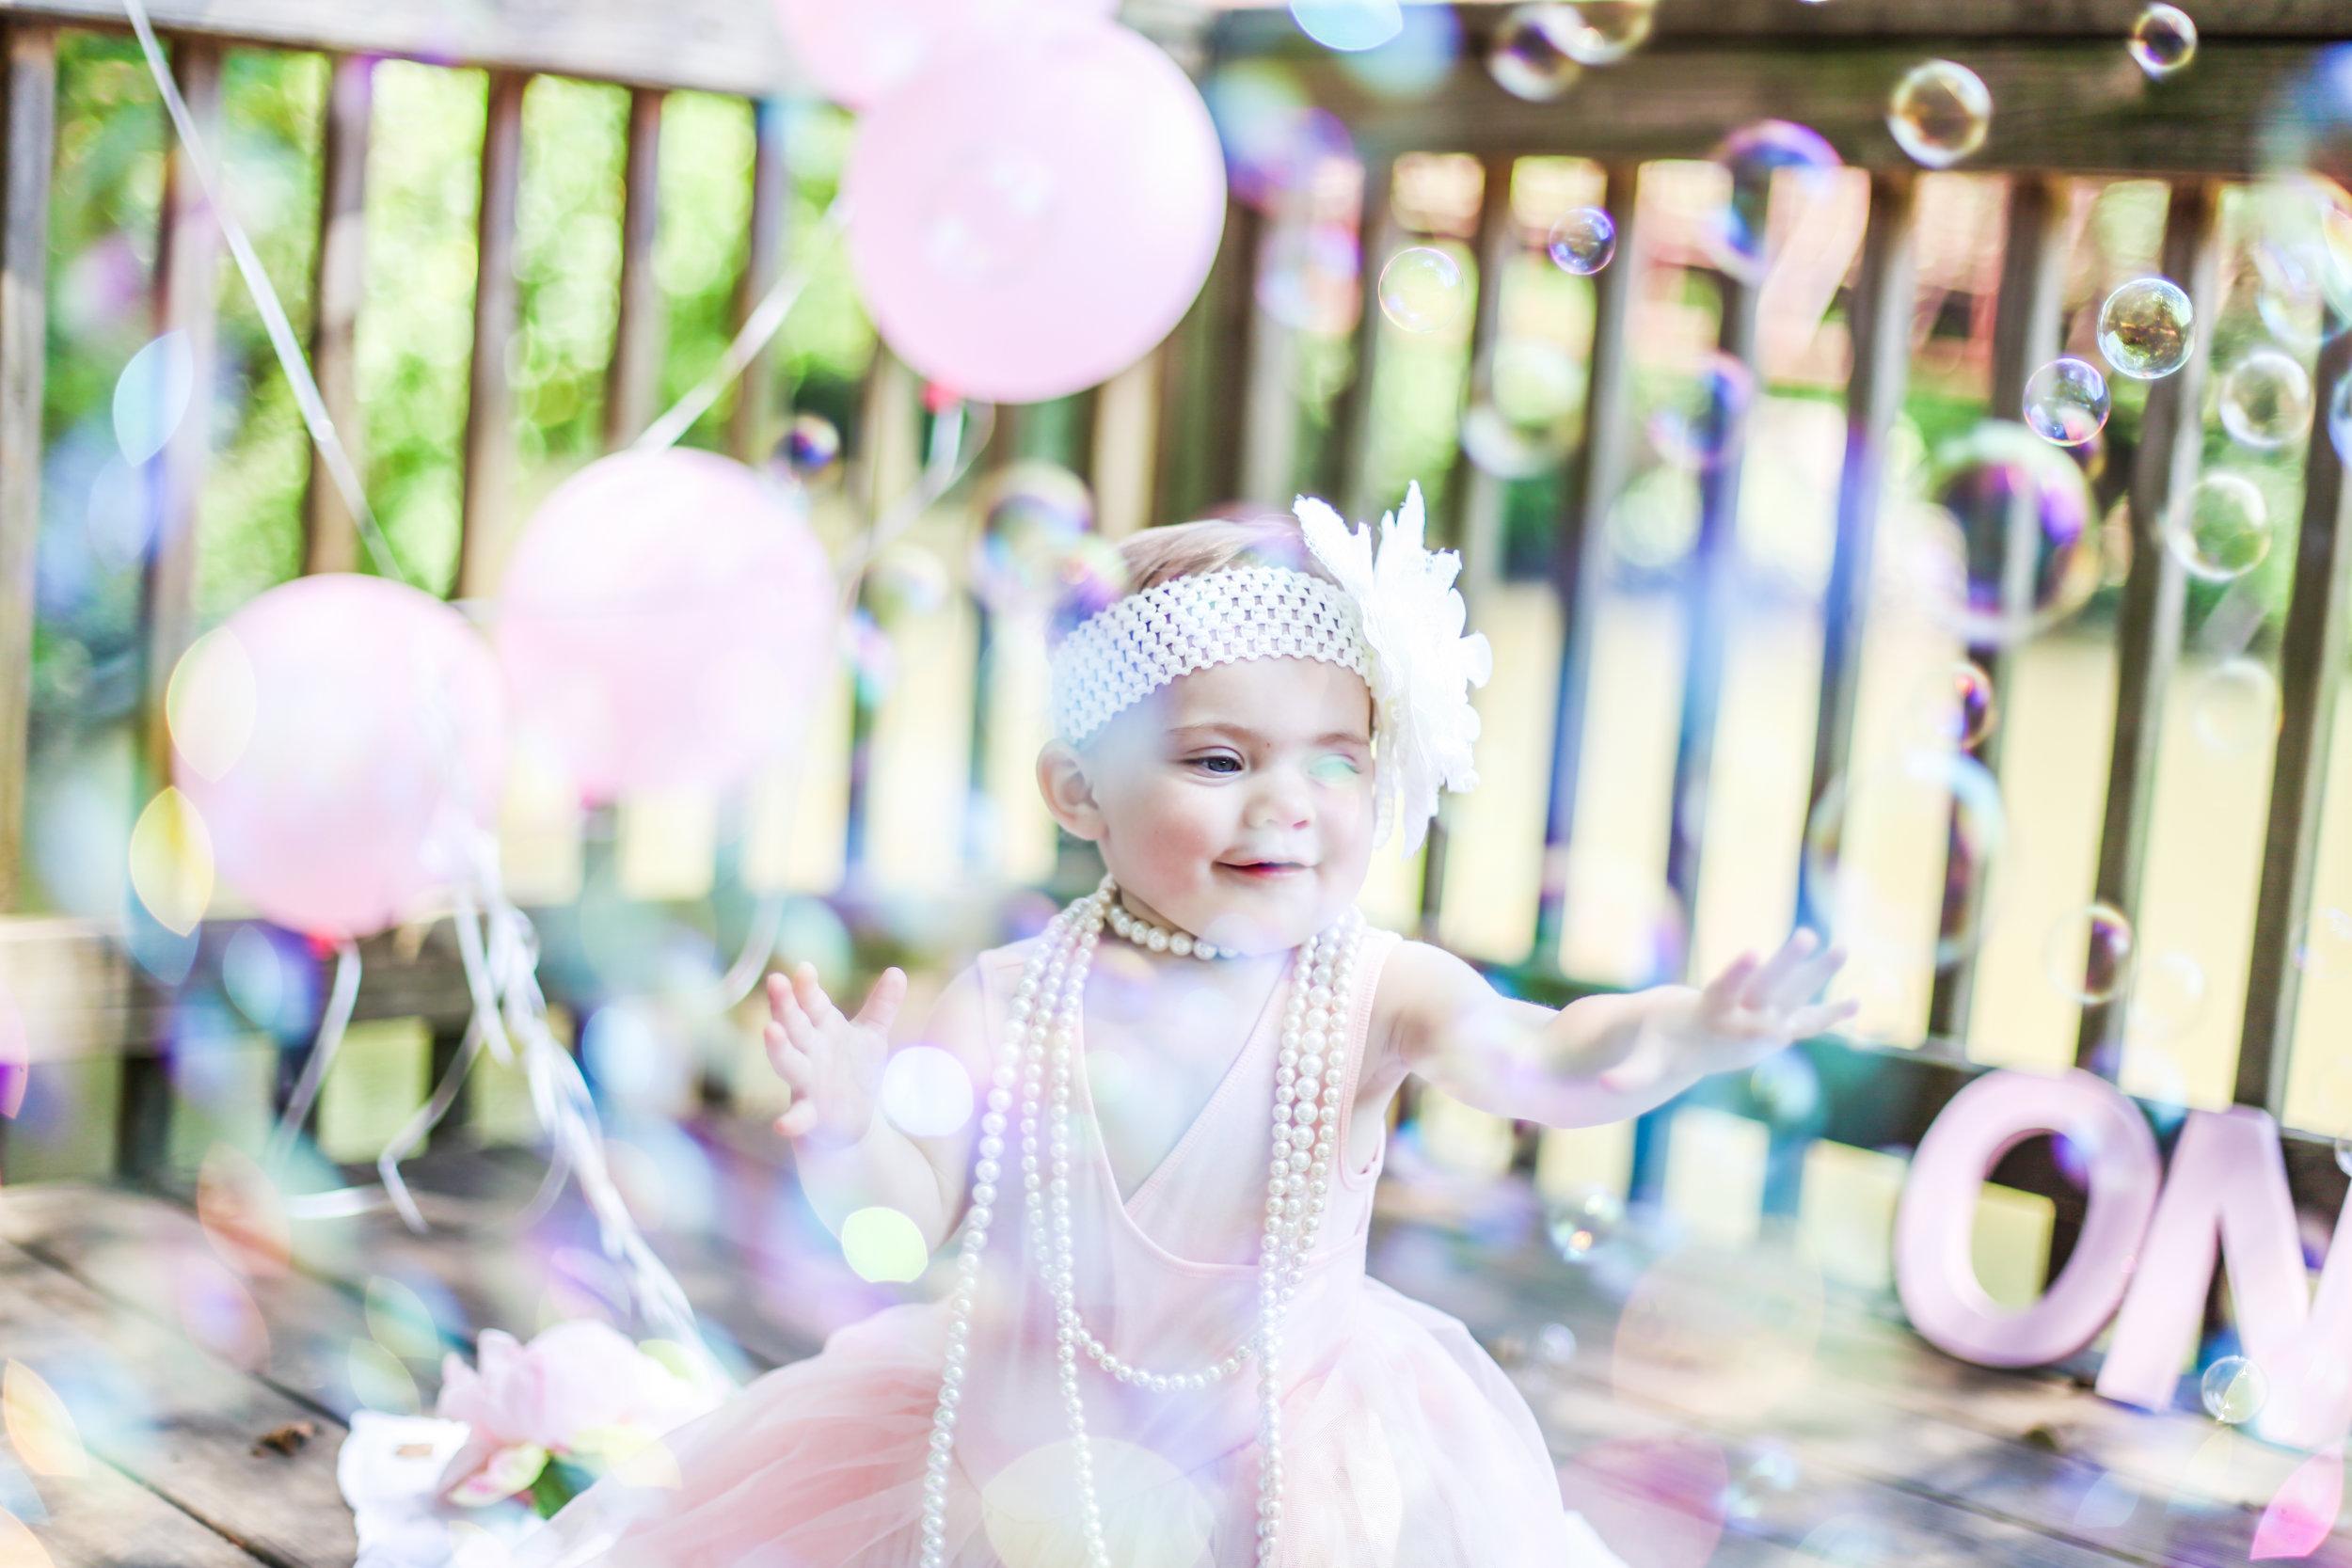 woodstock baby photography angela elliott-55.jpg